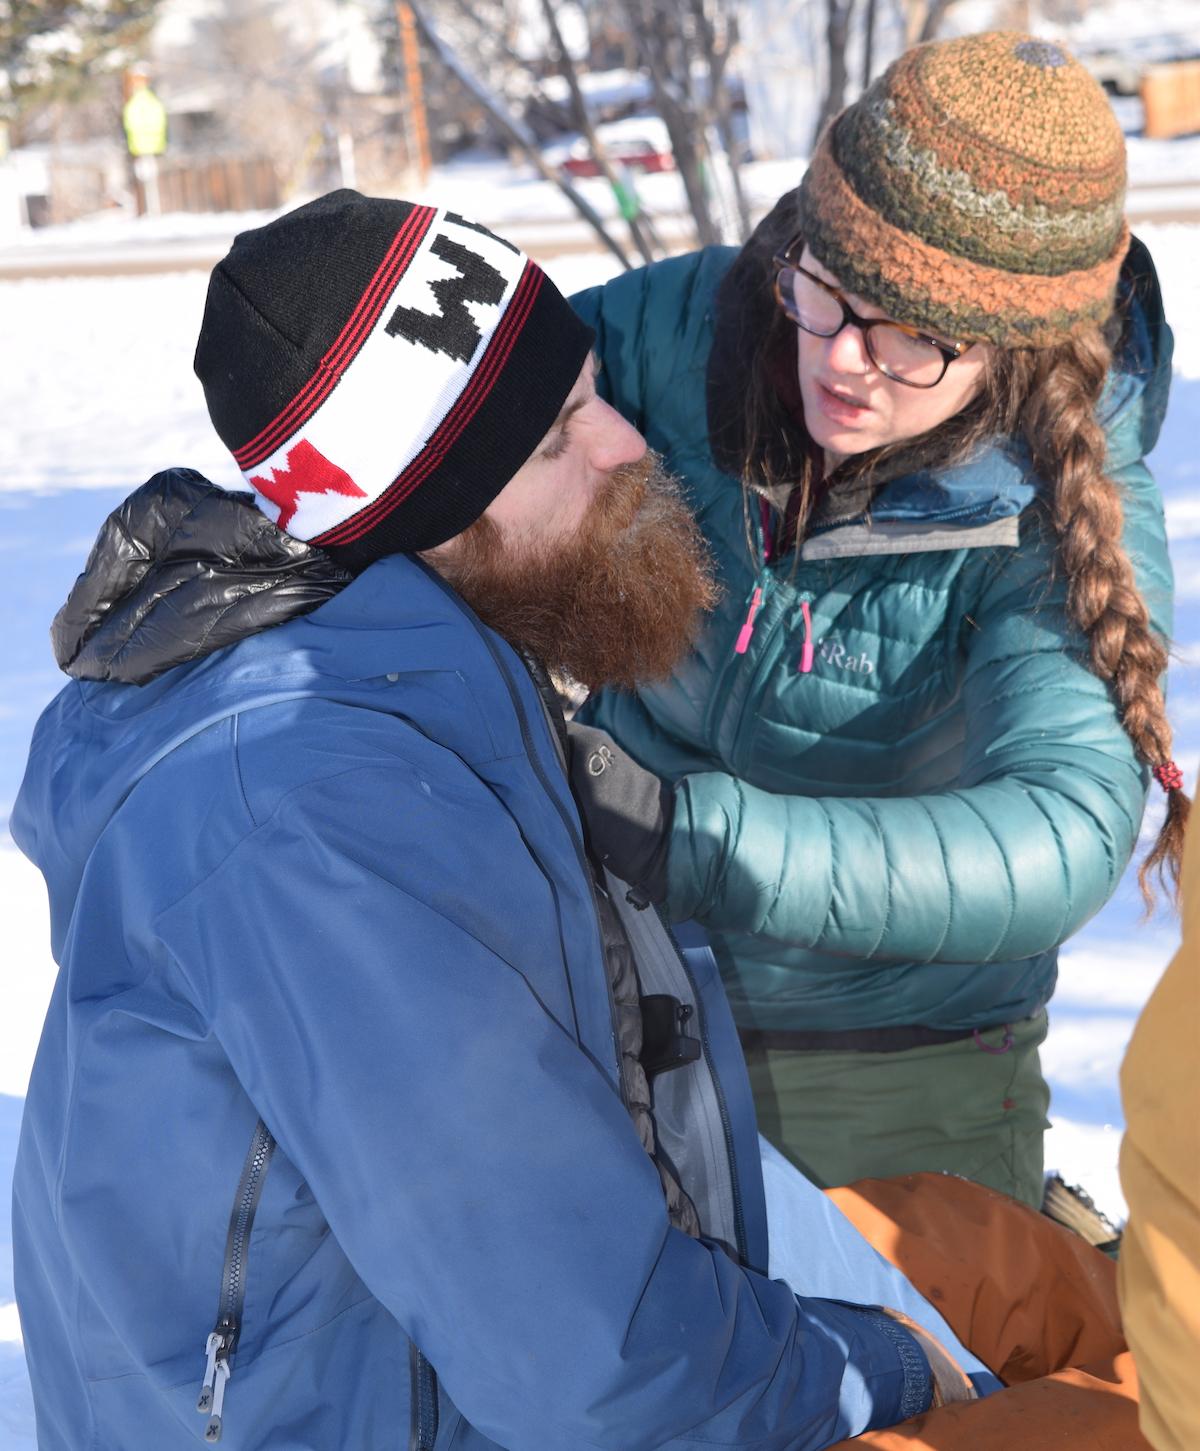 NOLS wilderness medicine students wearing winter gear practice taking a pulse